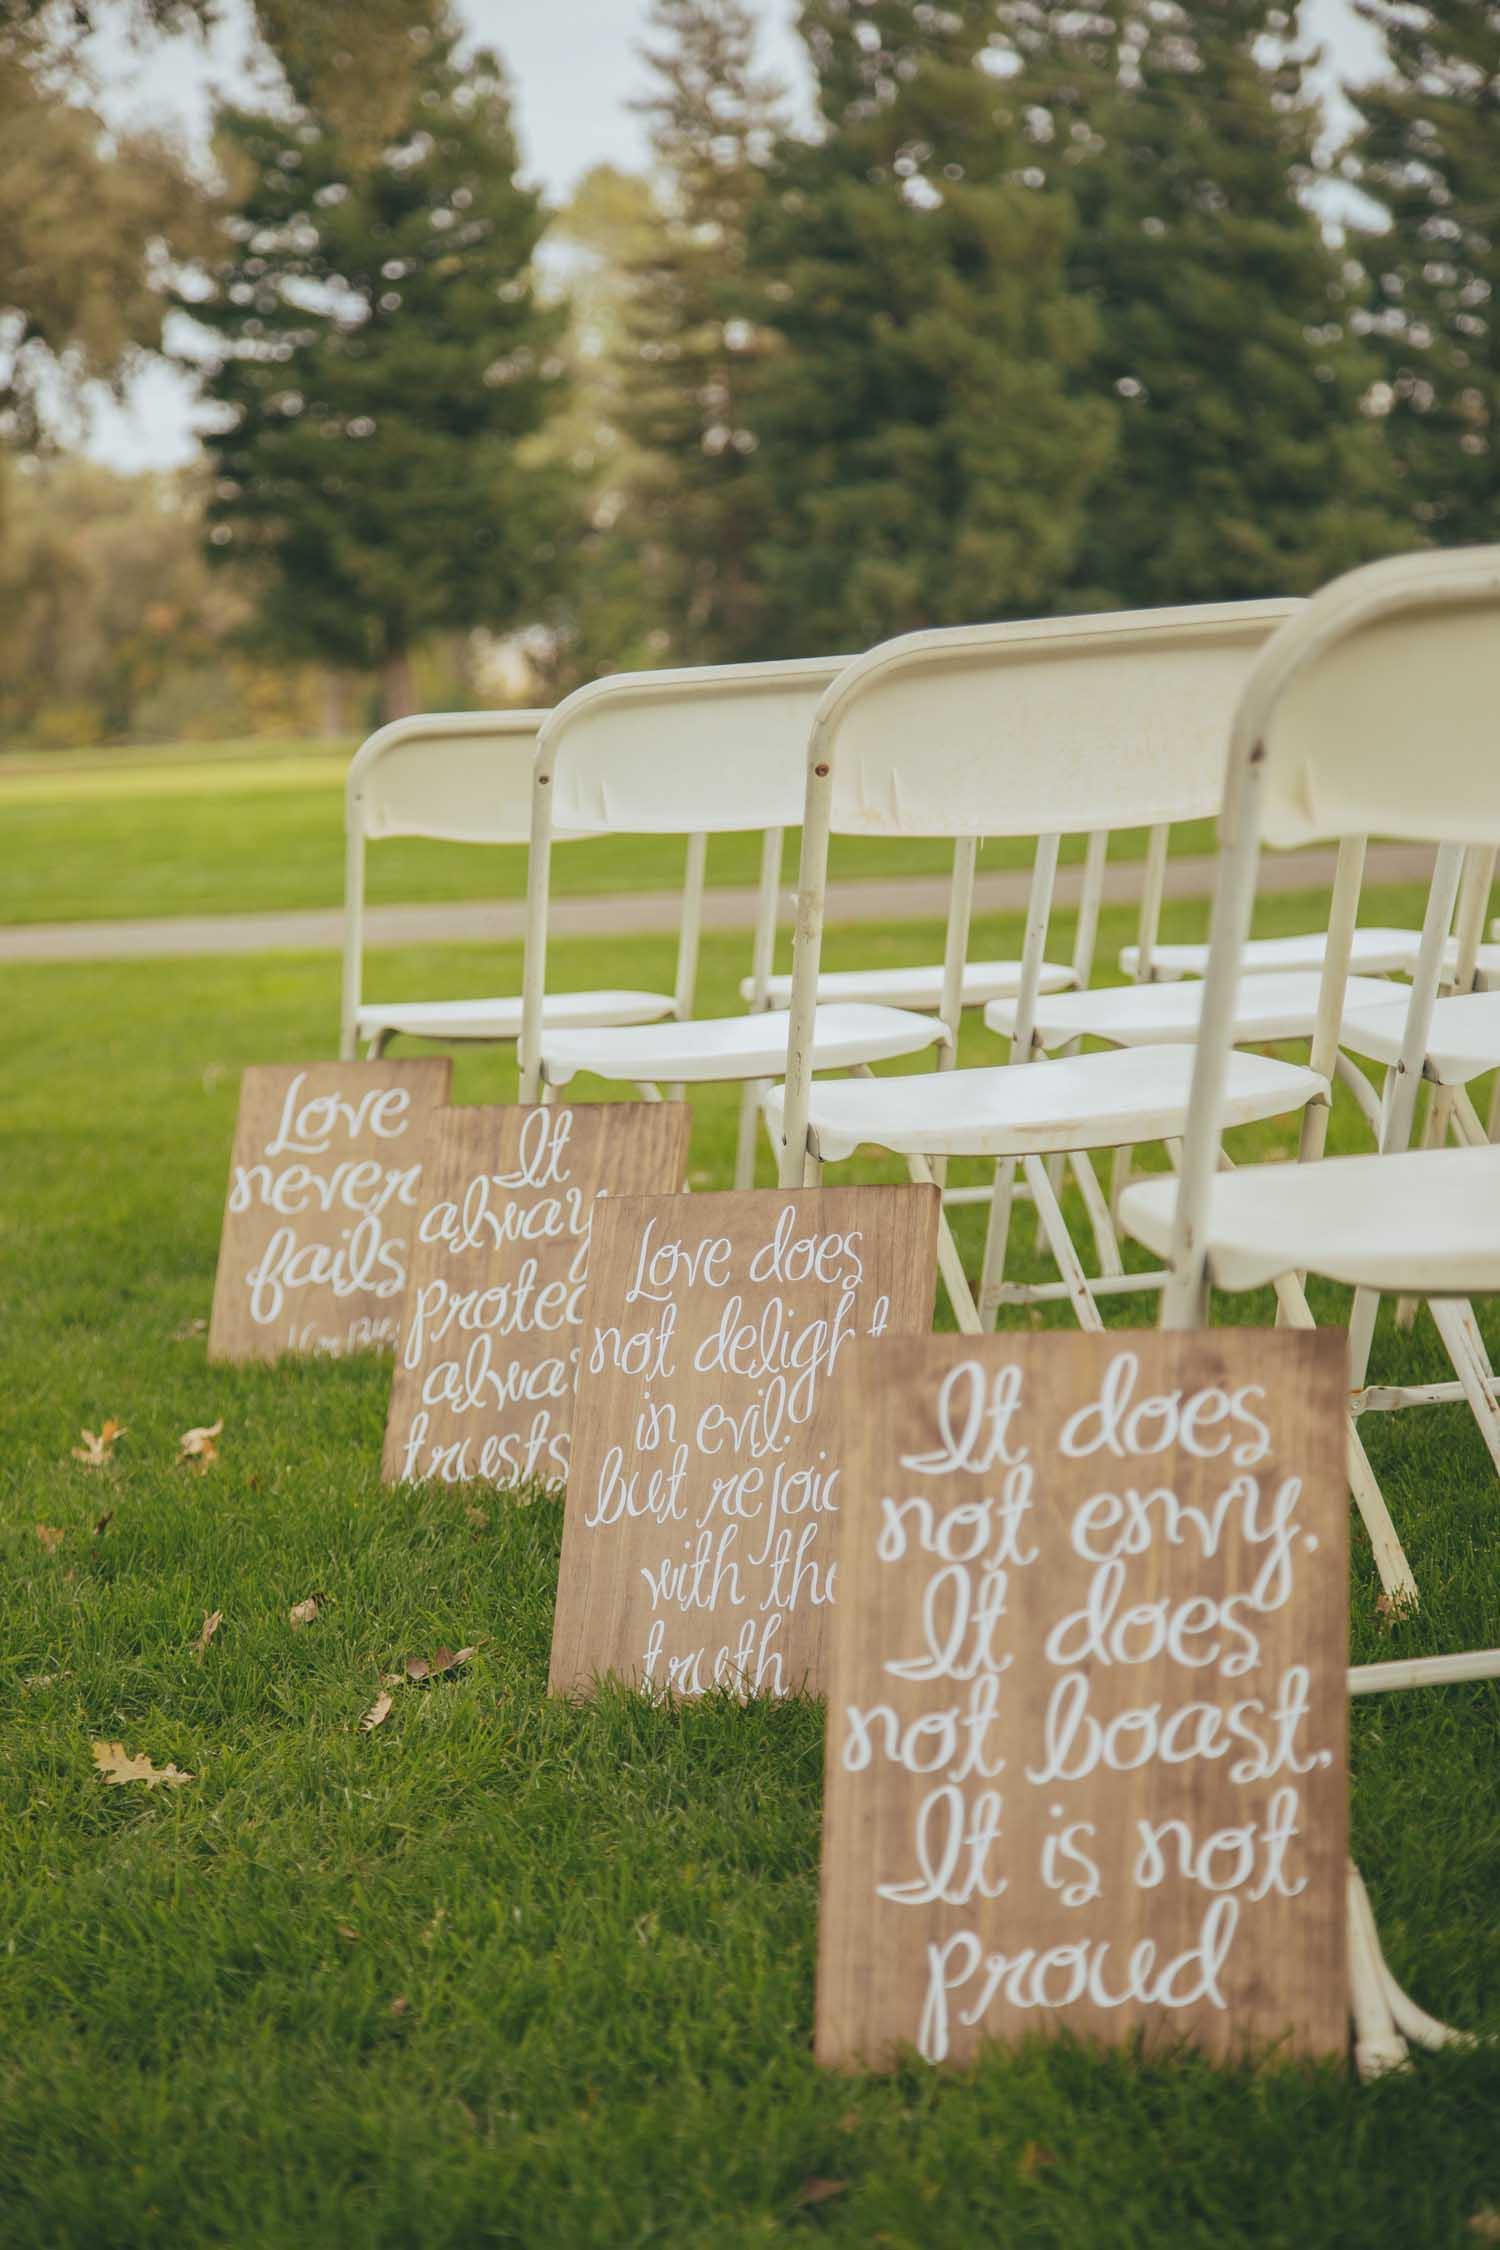 Bonnie-Scott-Rustic-Wedding-Chico-Ca-Butte-Creek-Country-Club2Bonnie-Scott-Rustic-Wedding-Chico-Ca-Butte-Creek-Country-Club.jpg